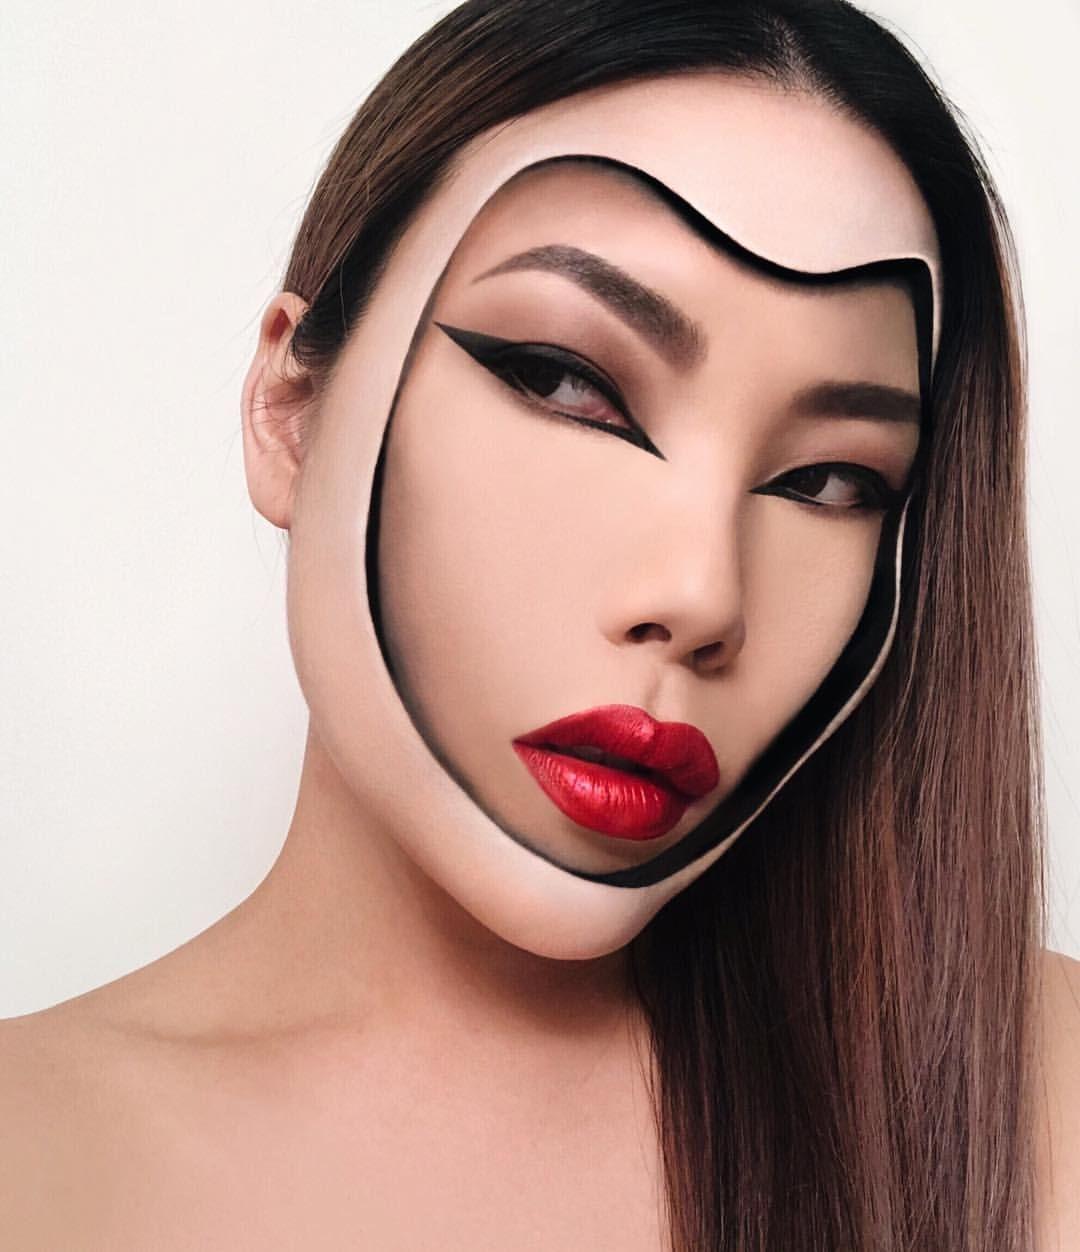 A Few Of The Makeup Illusion Pieces That I Ve Done Lately 10 Days Till The Mimlesoriginals Makeup Contest Ends Crazy Makeup Retro Makeup Face Art Makeup